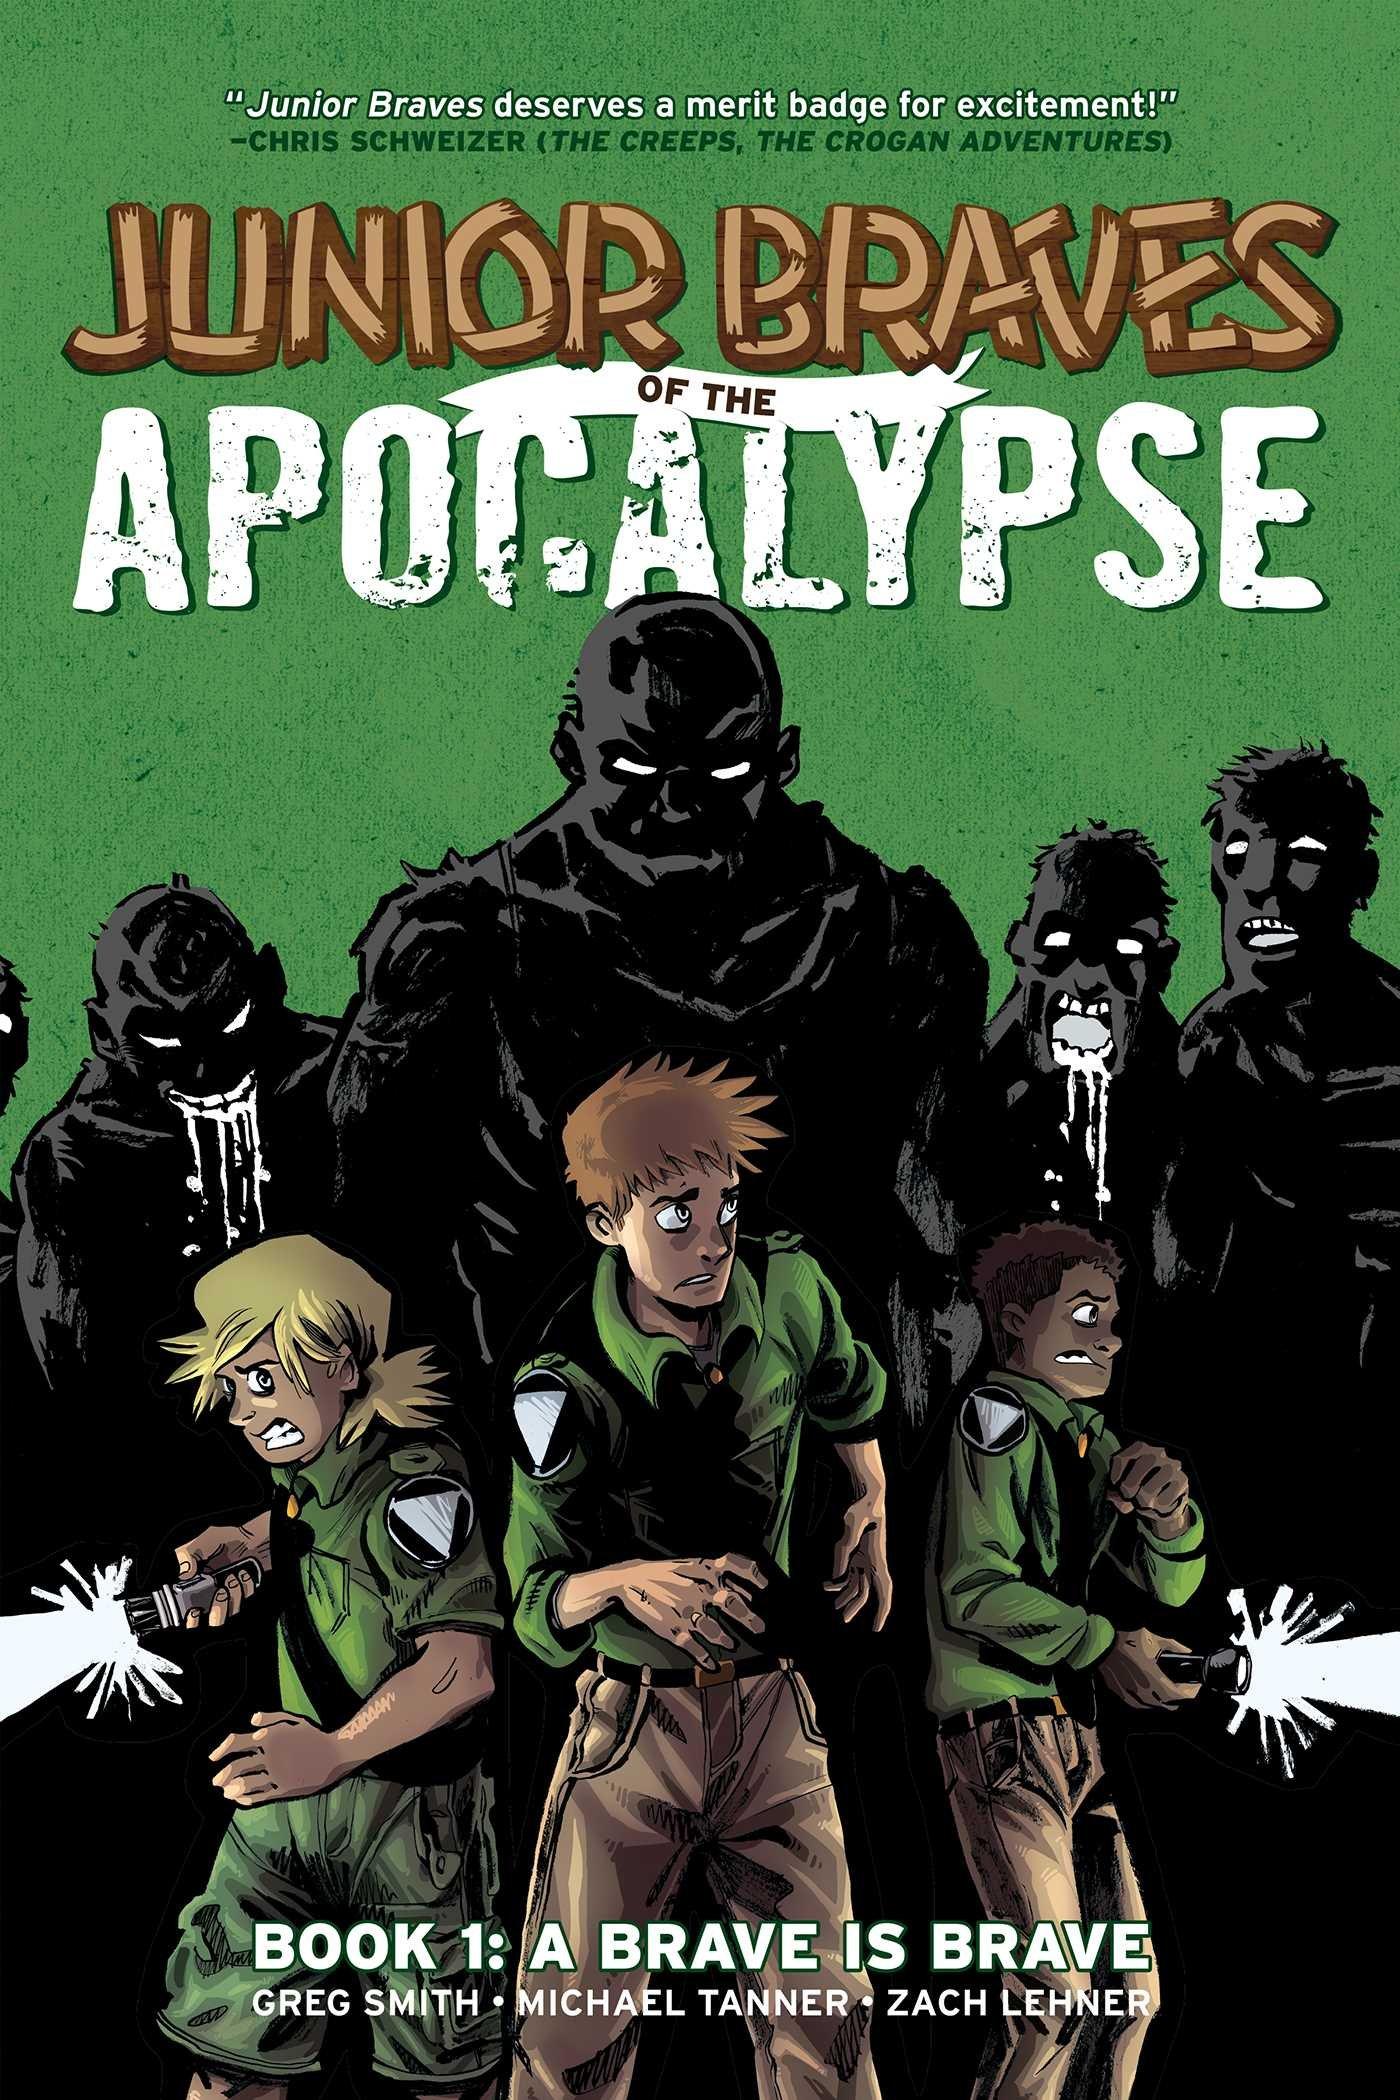 Junior Braves of the Apocalypse Vol. 1: A Brave is Brave ebook